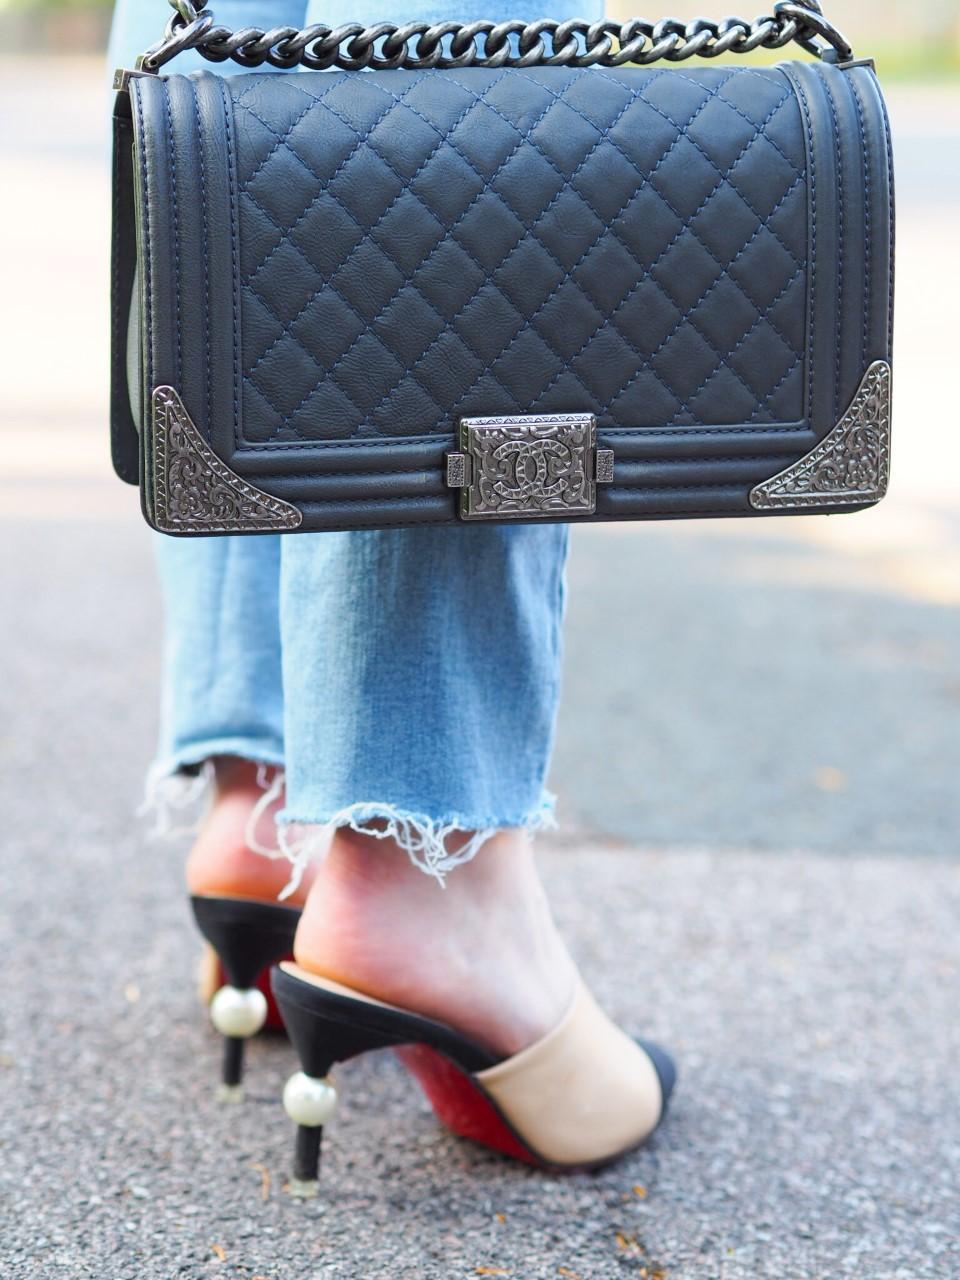 2019's Big Fashion Resolution